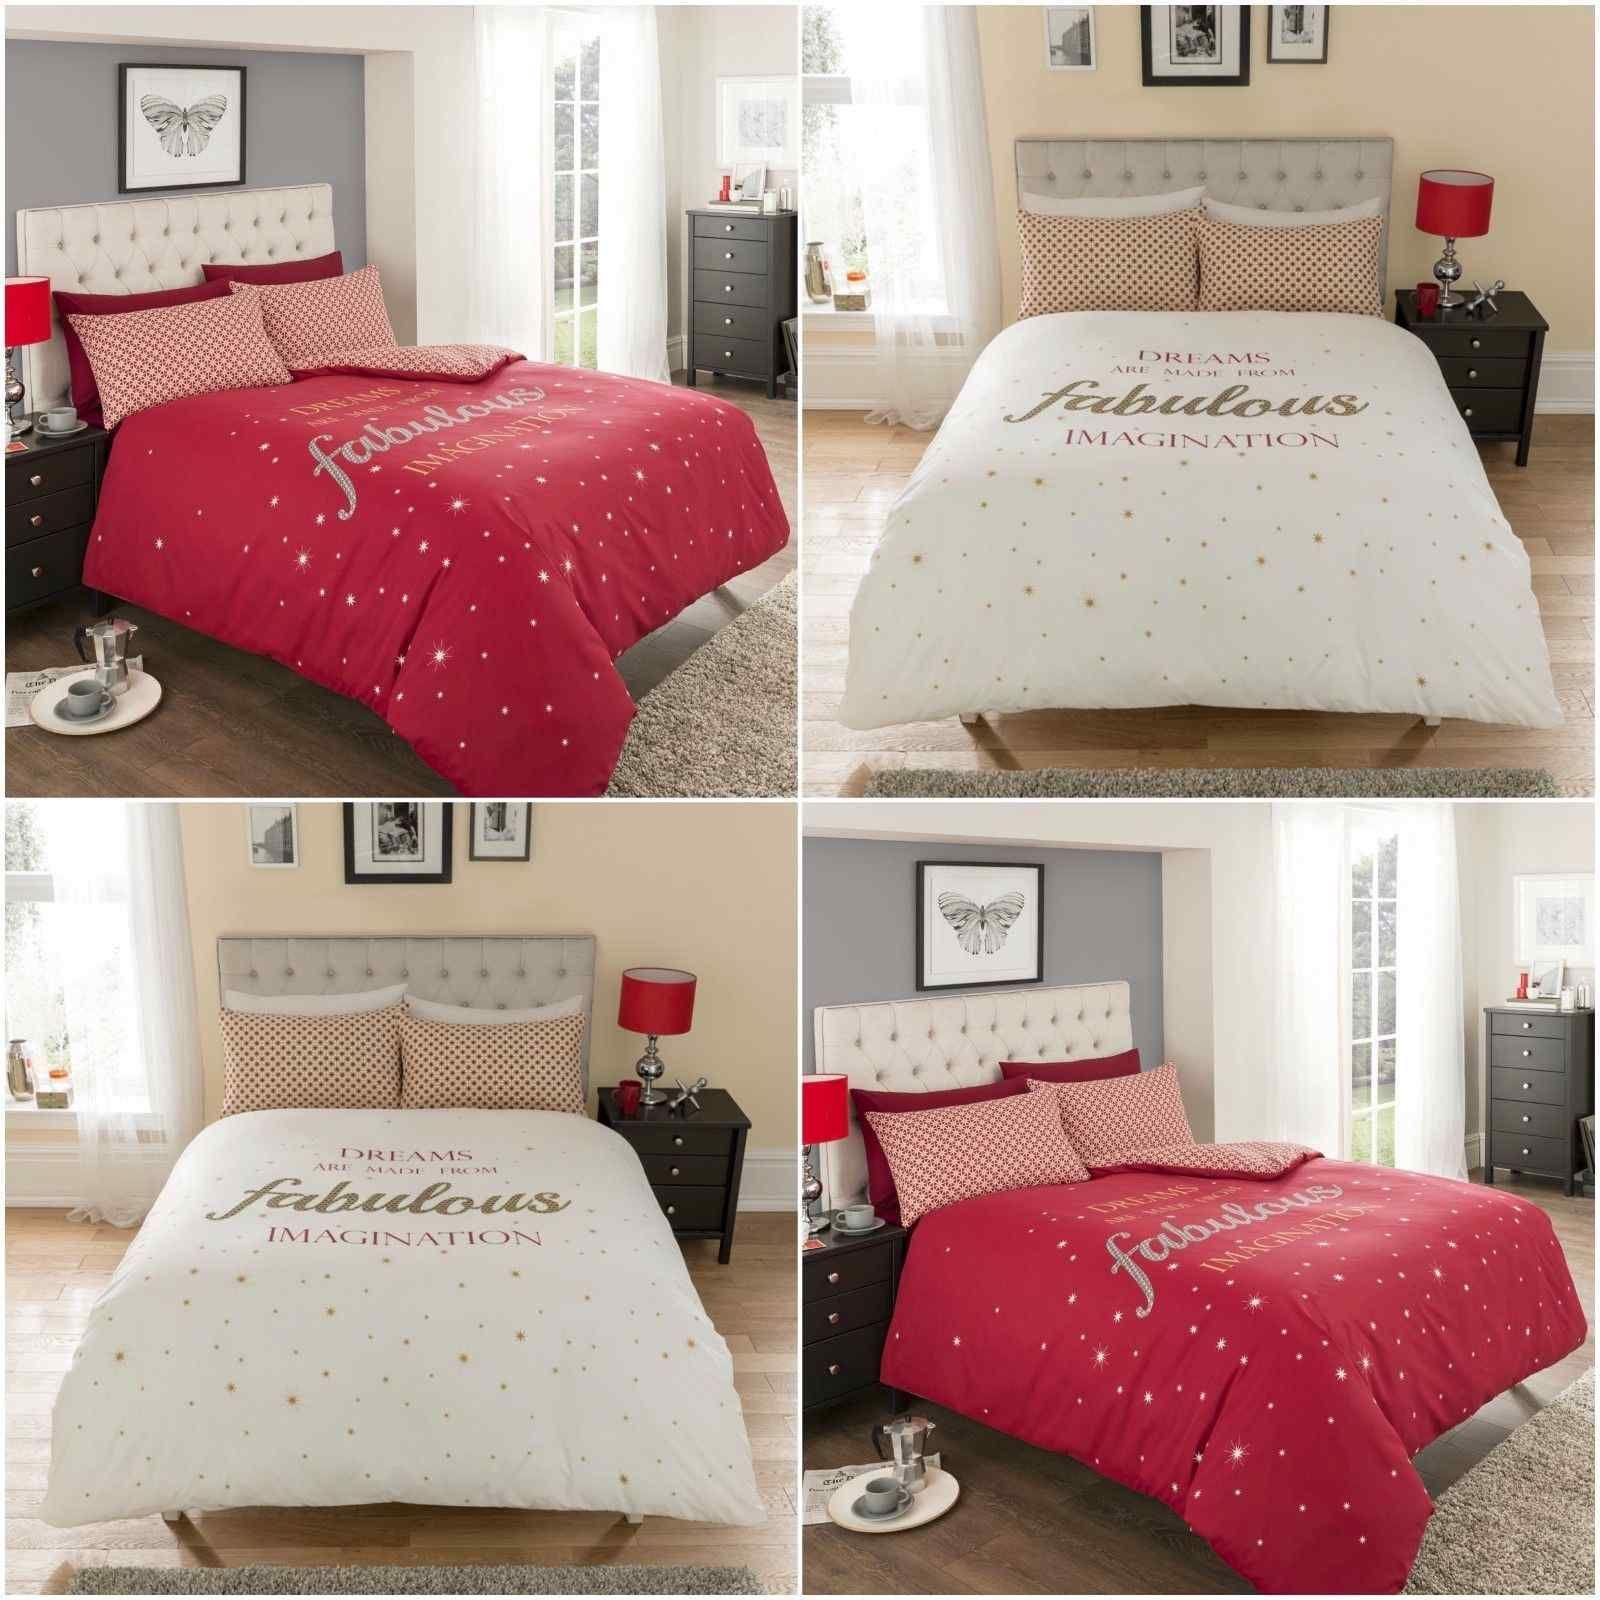 Luxury Fabulous Cream Red Duvet Quilt Bedding Set Linens Range Bed Linens Luxury Bed Linen Design Bed Linen Sets